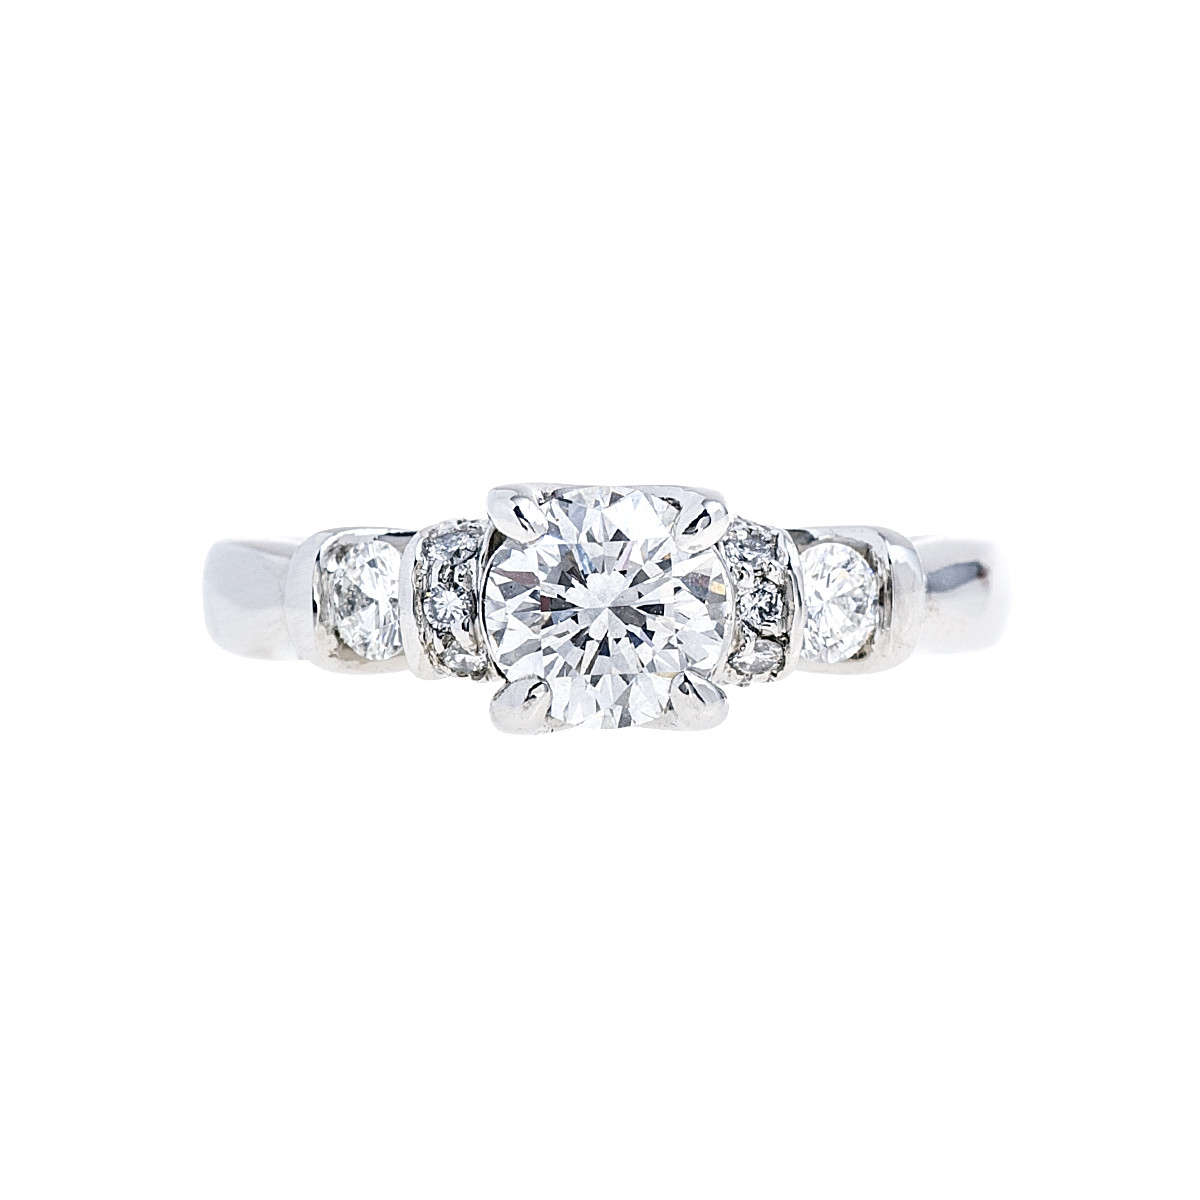 Vintage Verragio 1.01 CTW Diamond Ring